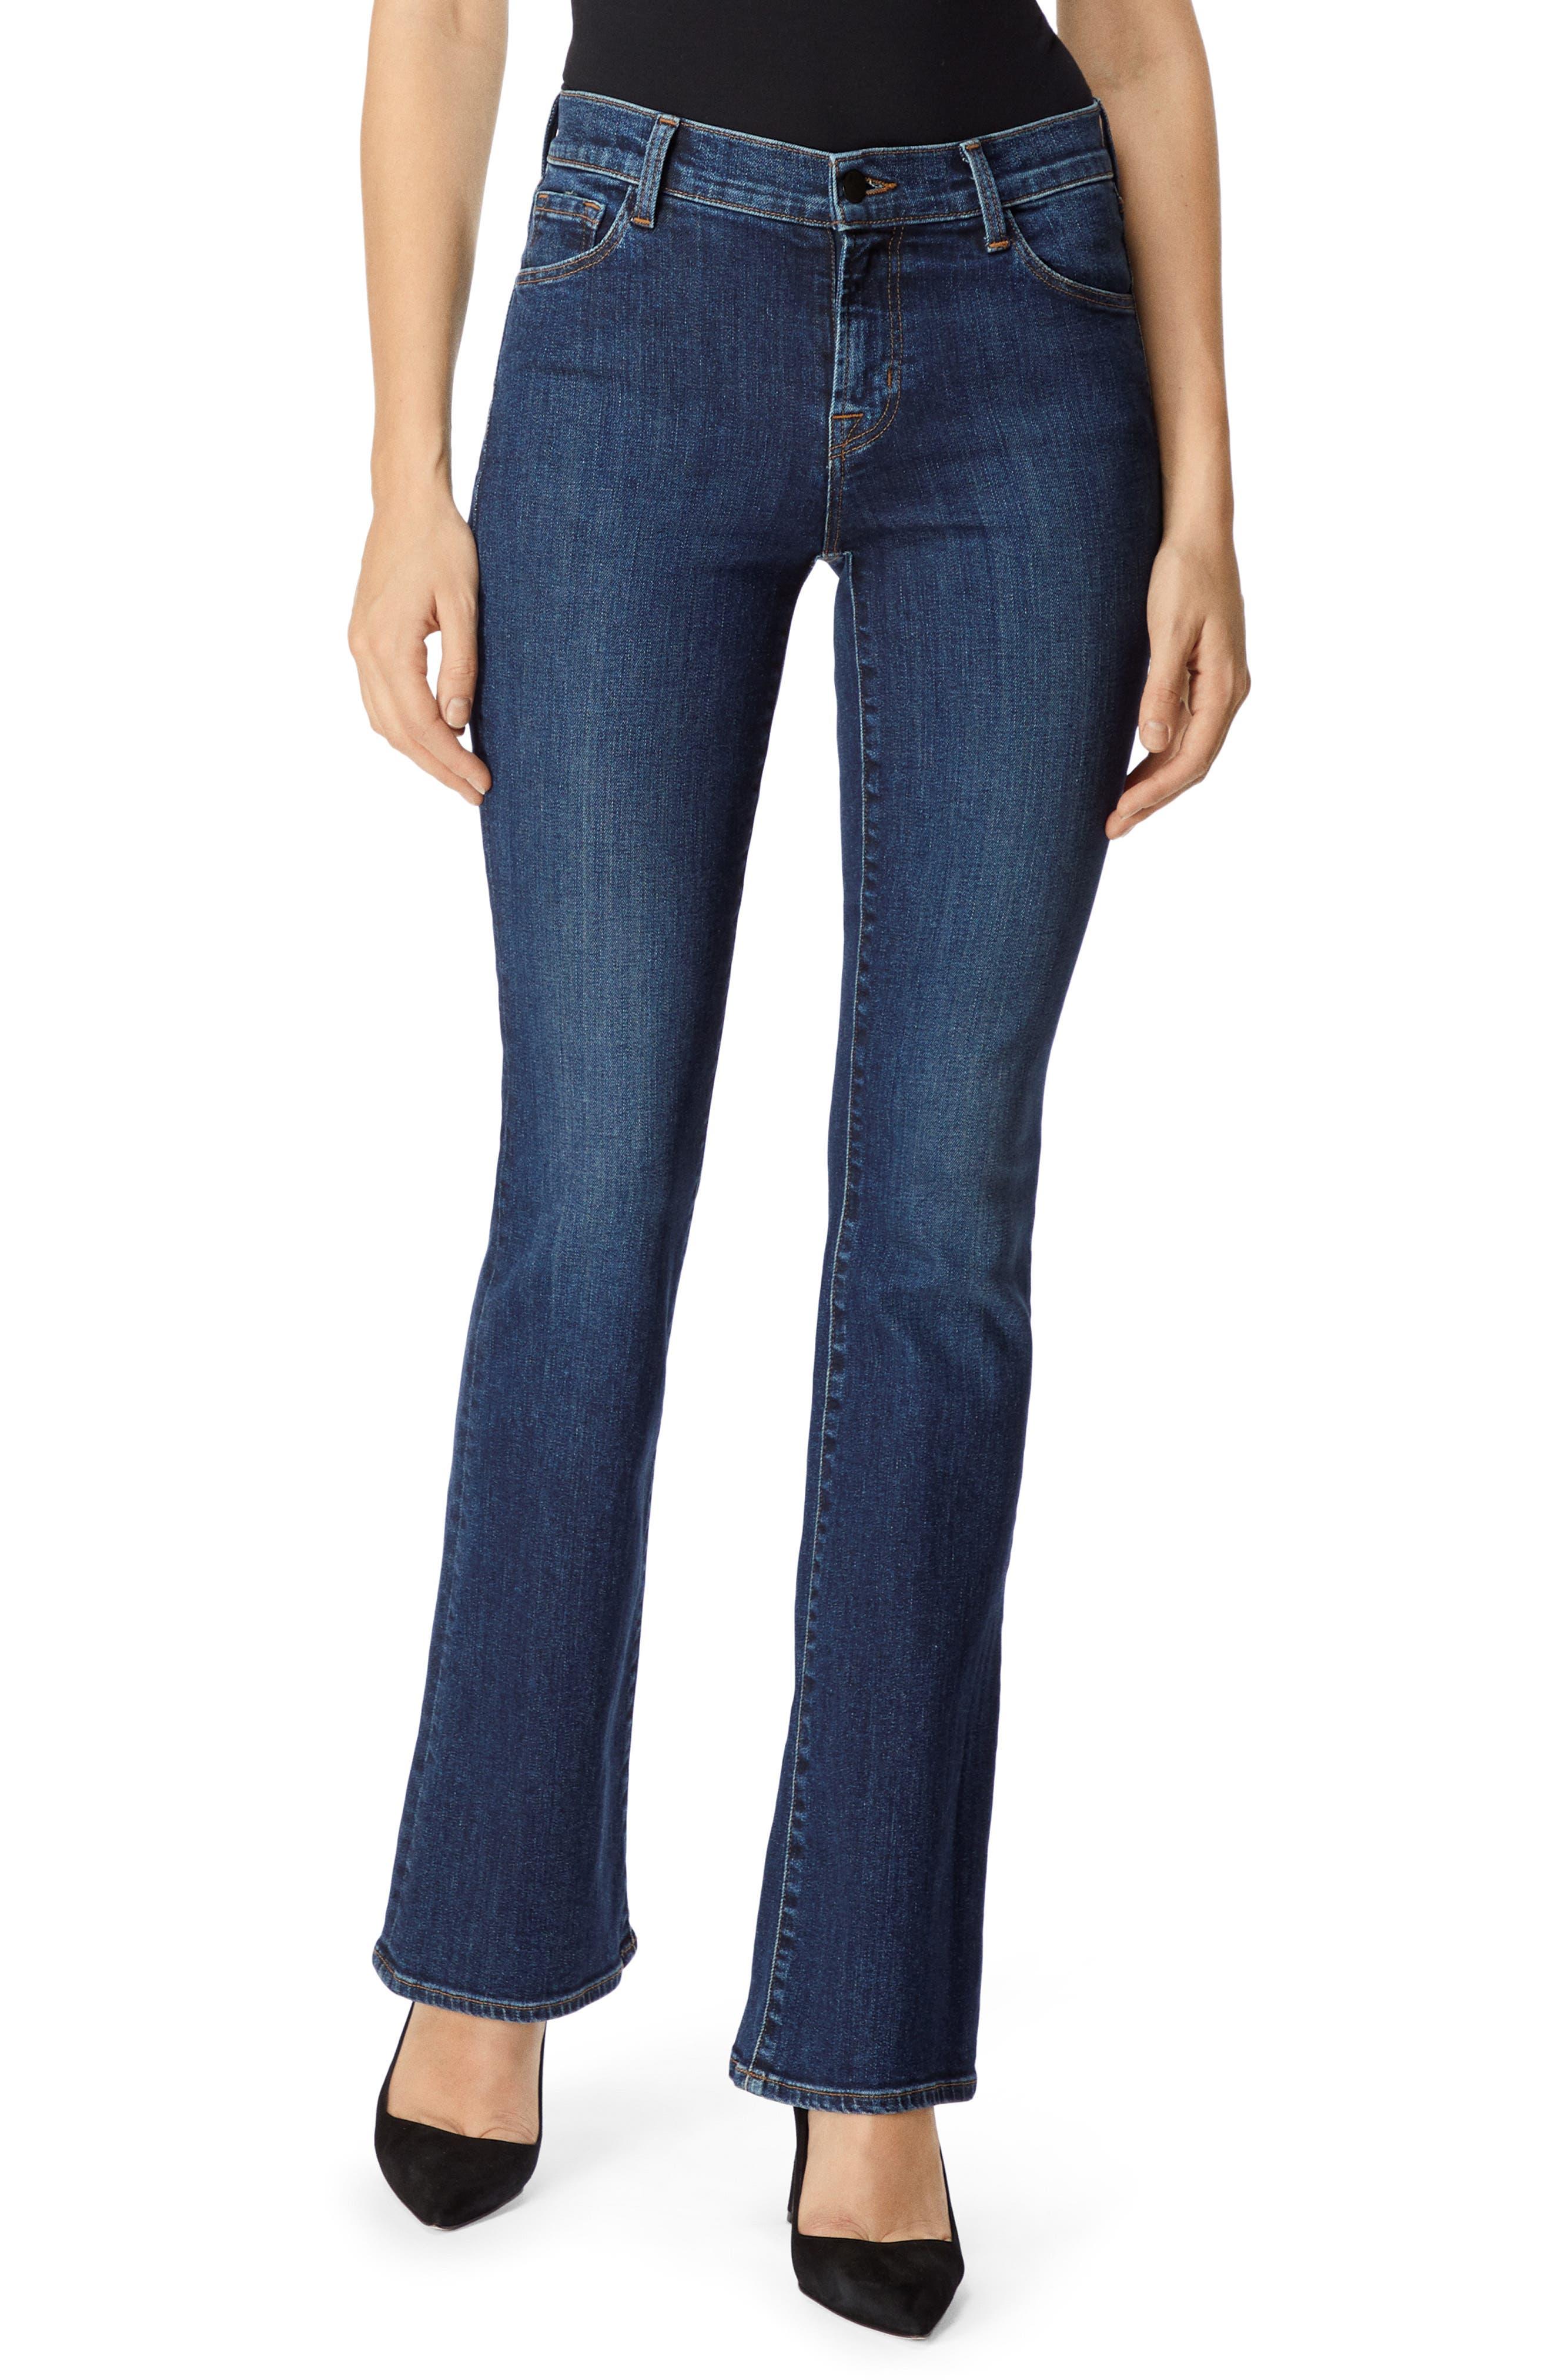 Sallie Mid-Rise Boot-Cut Jeans - Blue Size 26